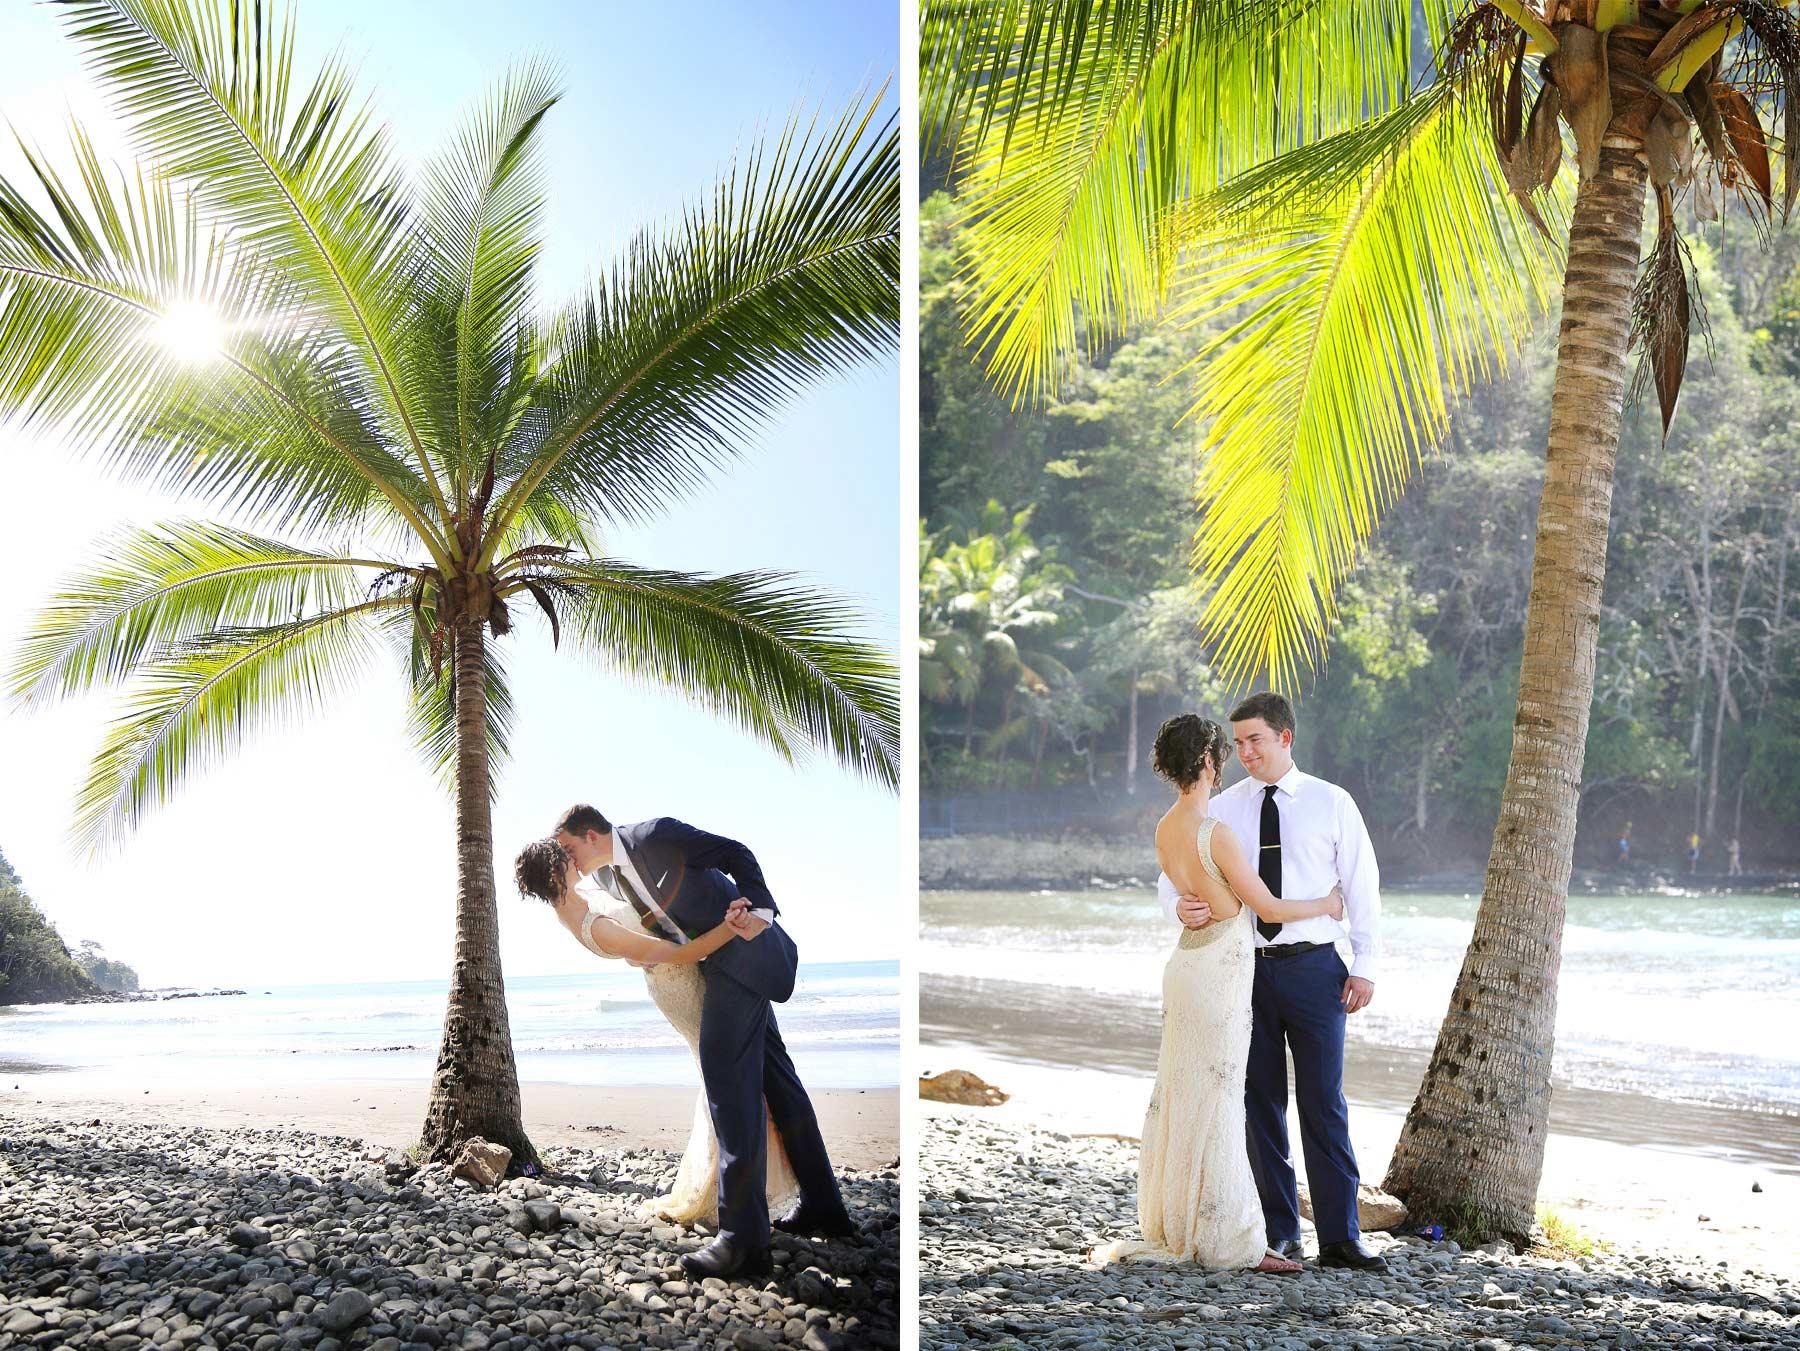 09-Costa-Rica-Wedding-Photography-by-Vick-Photography-Jaco-Tropical-Beach-Villa-Caletas-Resort-Palm-Trees-Alli-and-Duncan.jpg